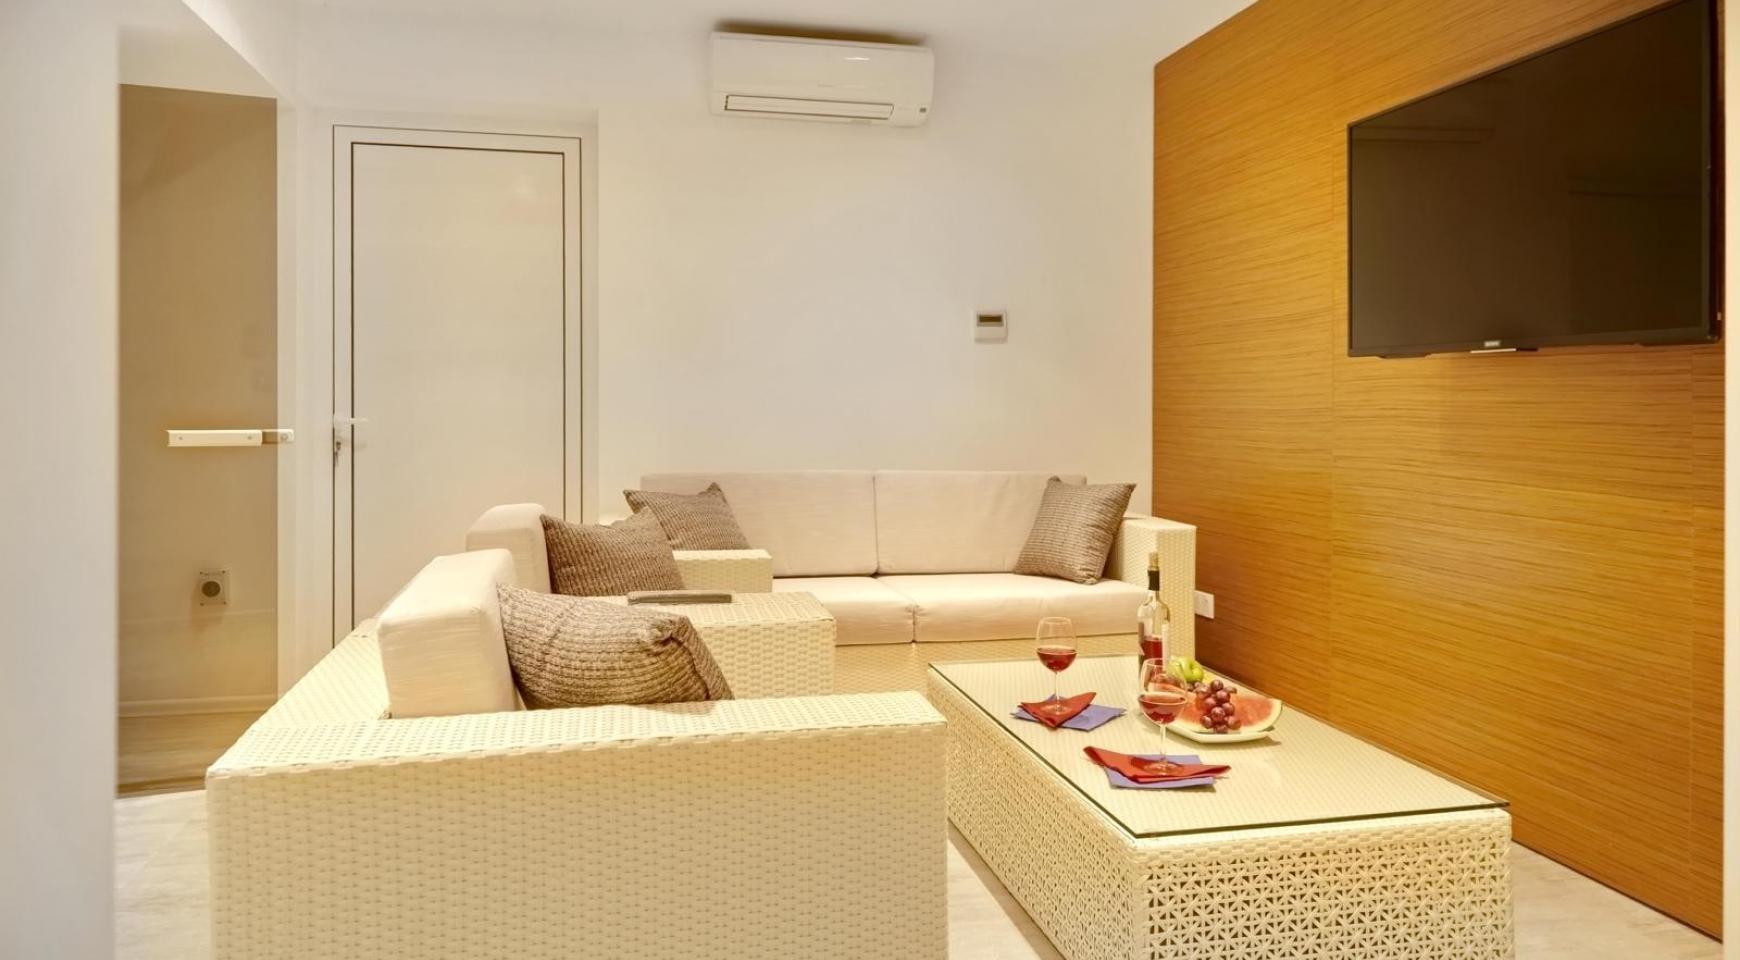 New Luxurious 4 Bedroom Villa in the Tourist Area - 43